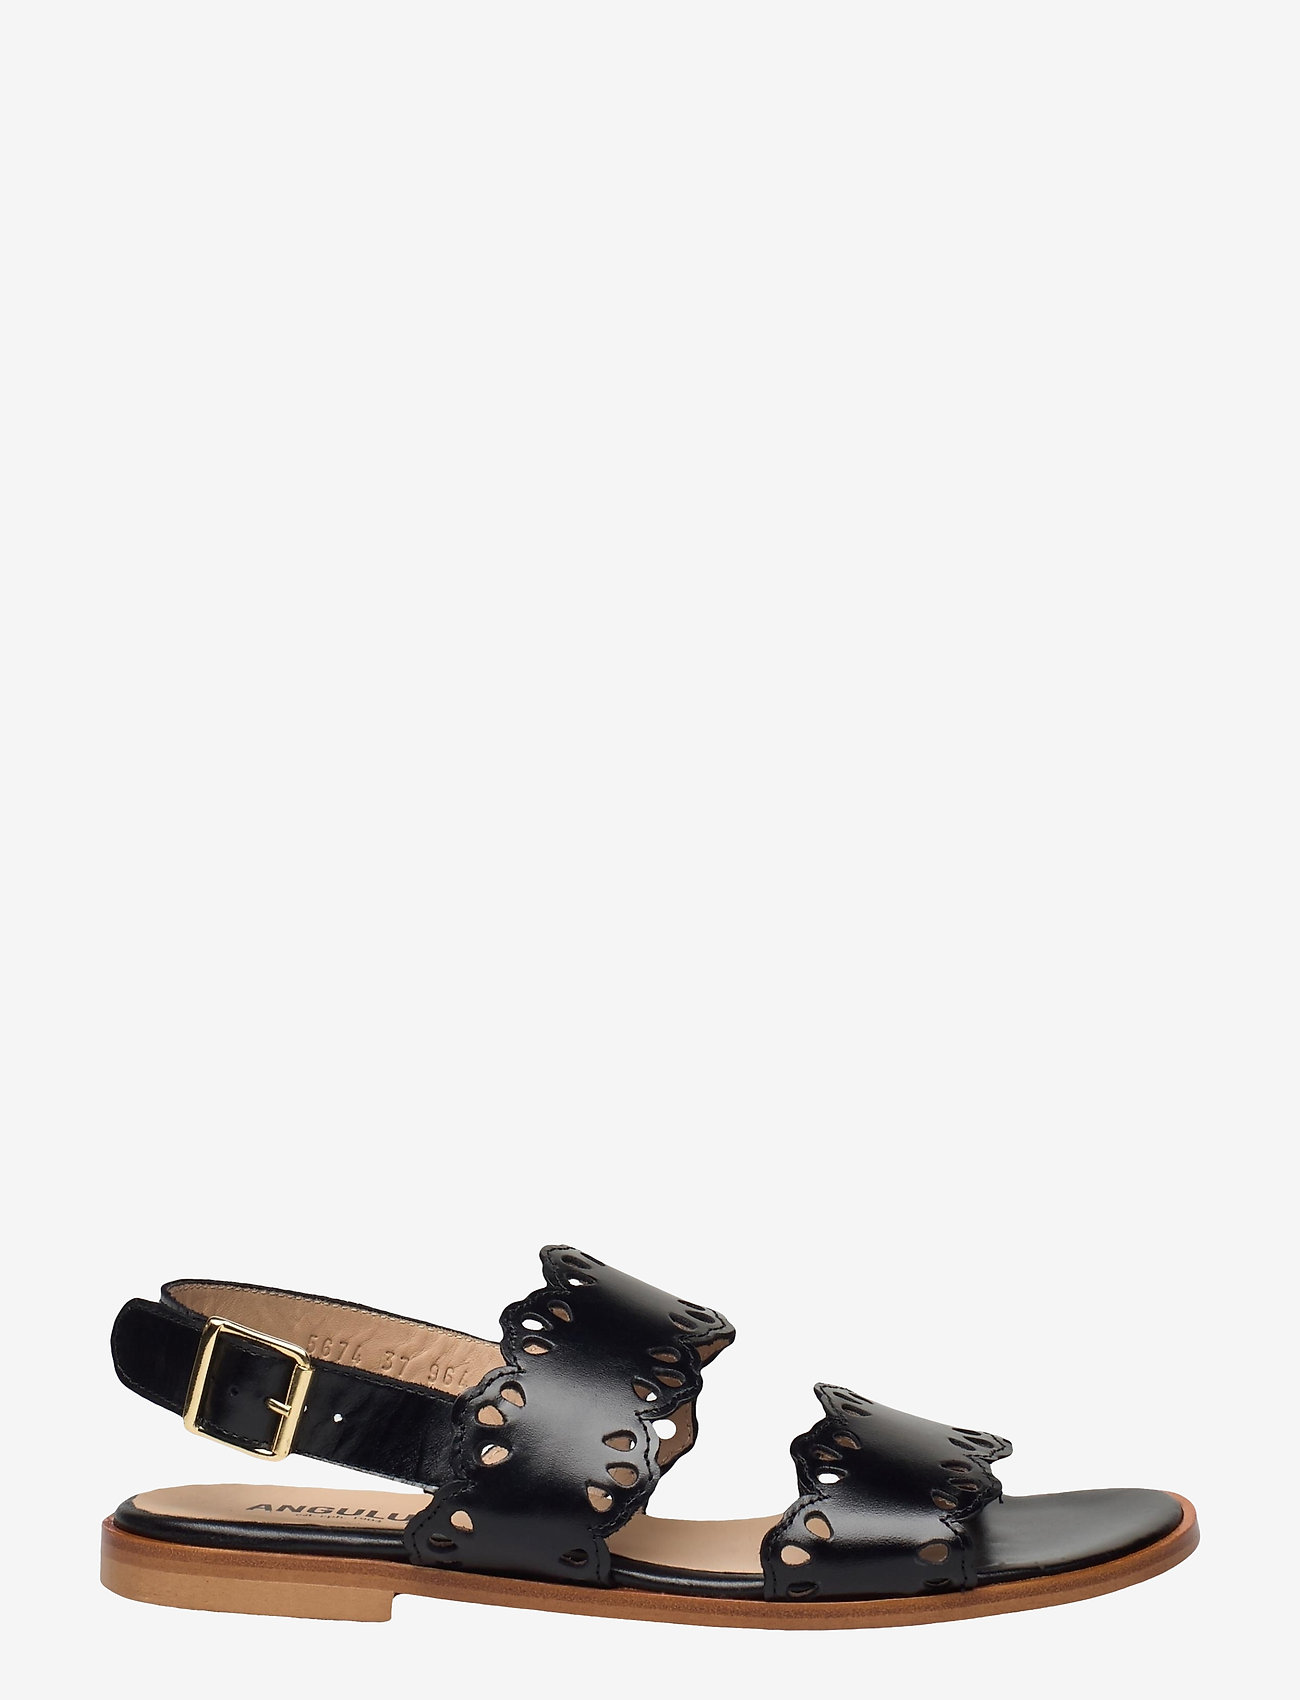 ANGULUS - Sandals - flat - open toe - op - flache sandalen - 1835 black - 1